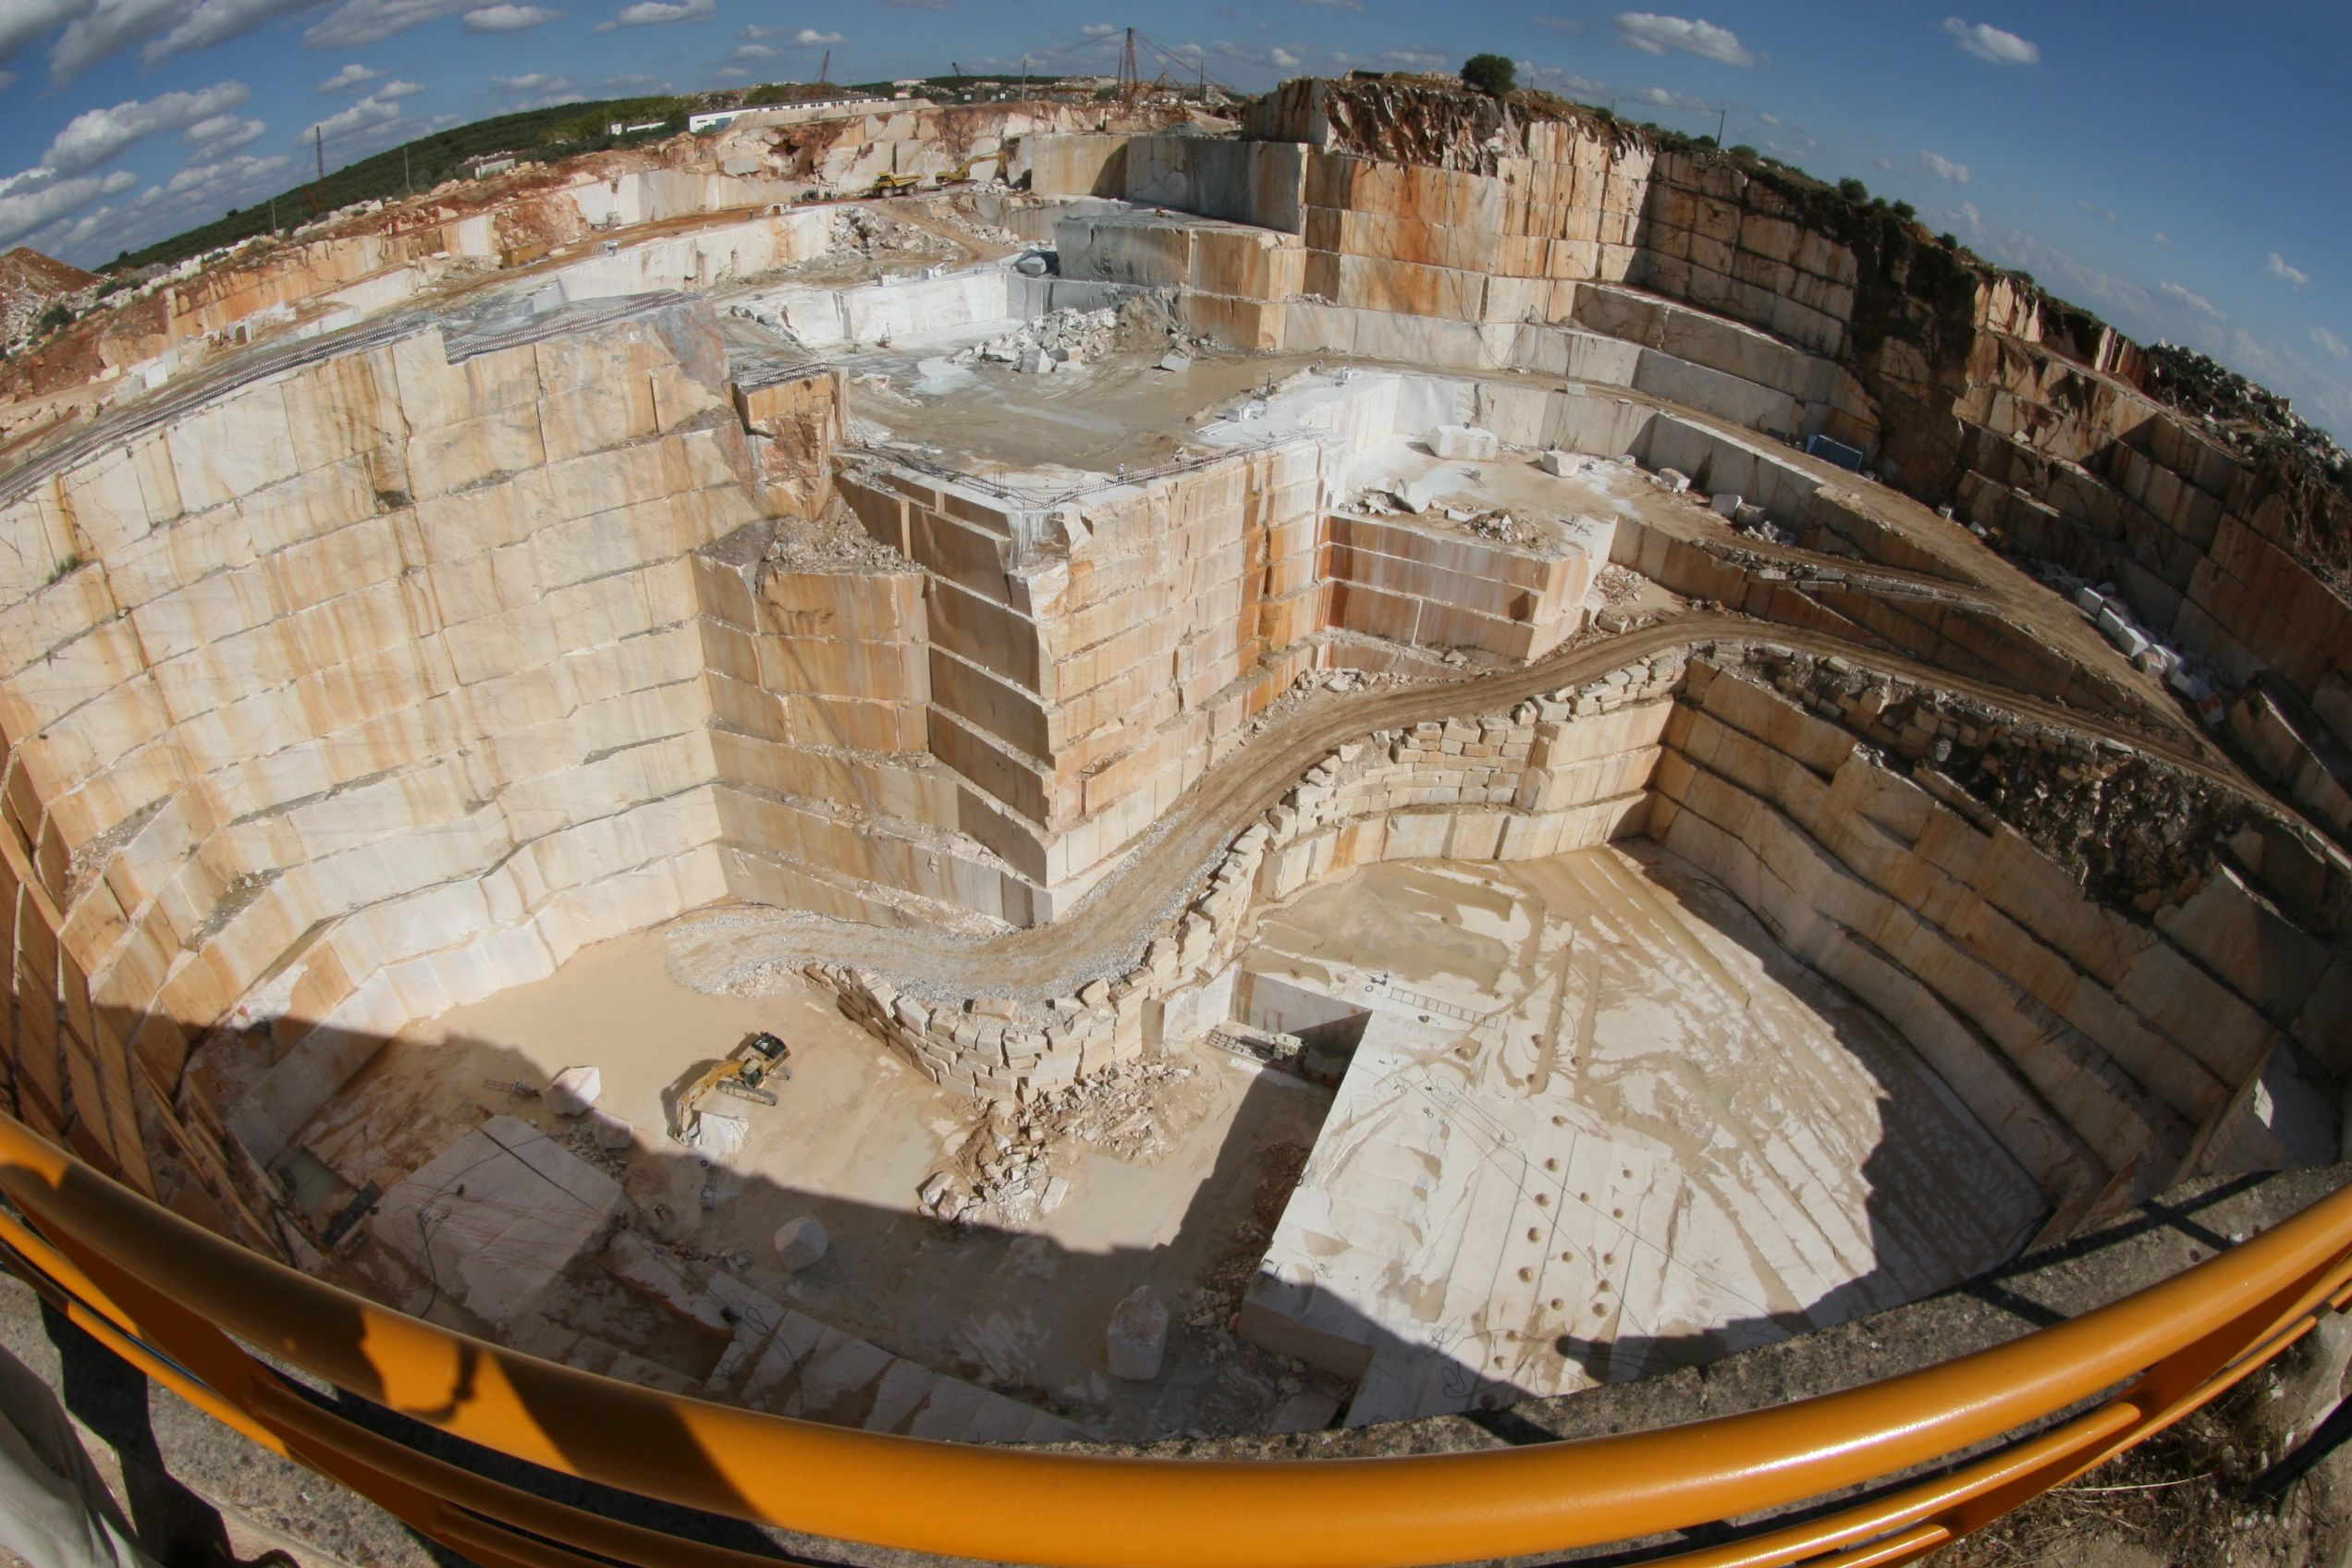 granite quarry 121 n oak gq st, granite quarry, nc is a 1276 sq ft 1 bath home sold in granite quarry, north carolina.